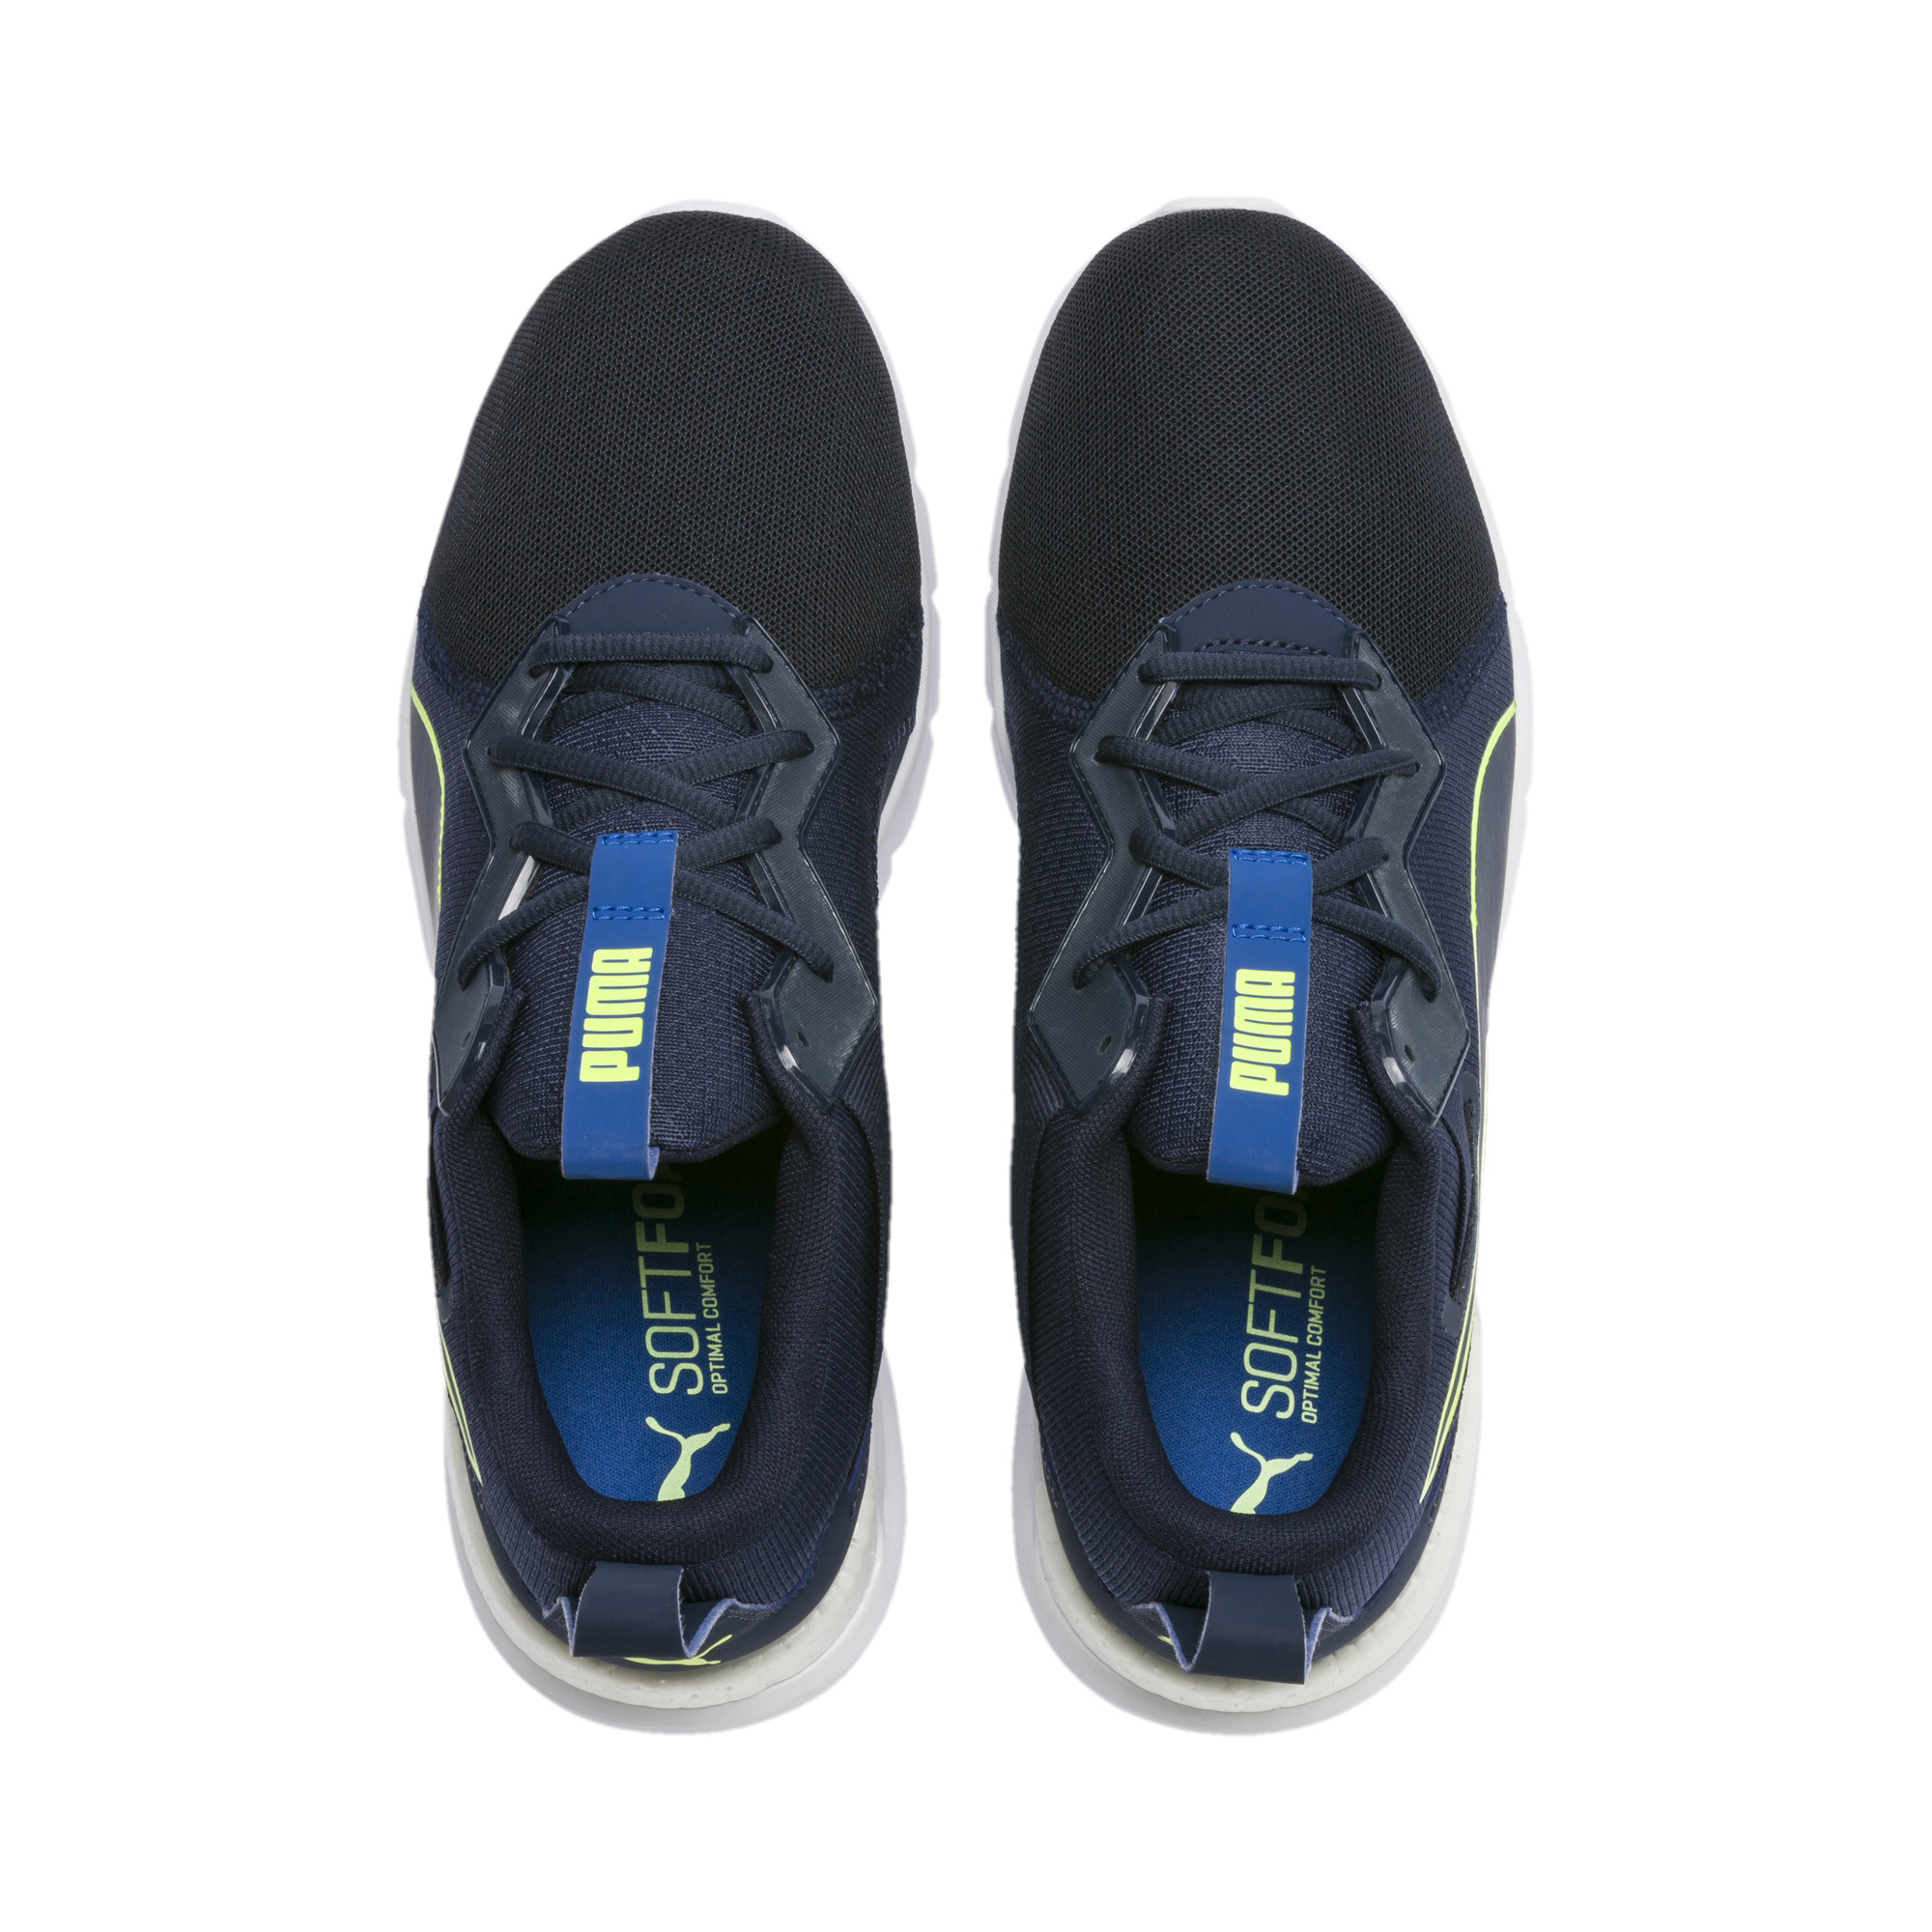 PUMA-NRGY-Dynamo-Futuro-Men-039-s-Running-Shoes-Men-Shoe-Running thumbnail 8